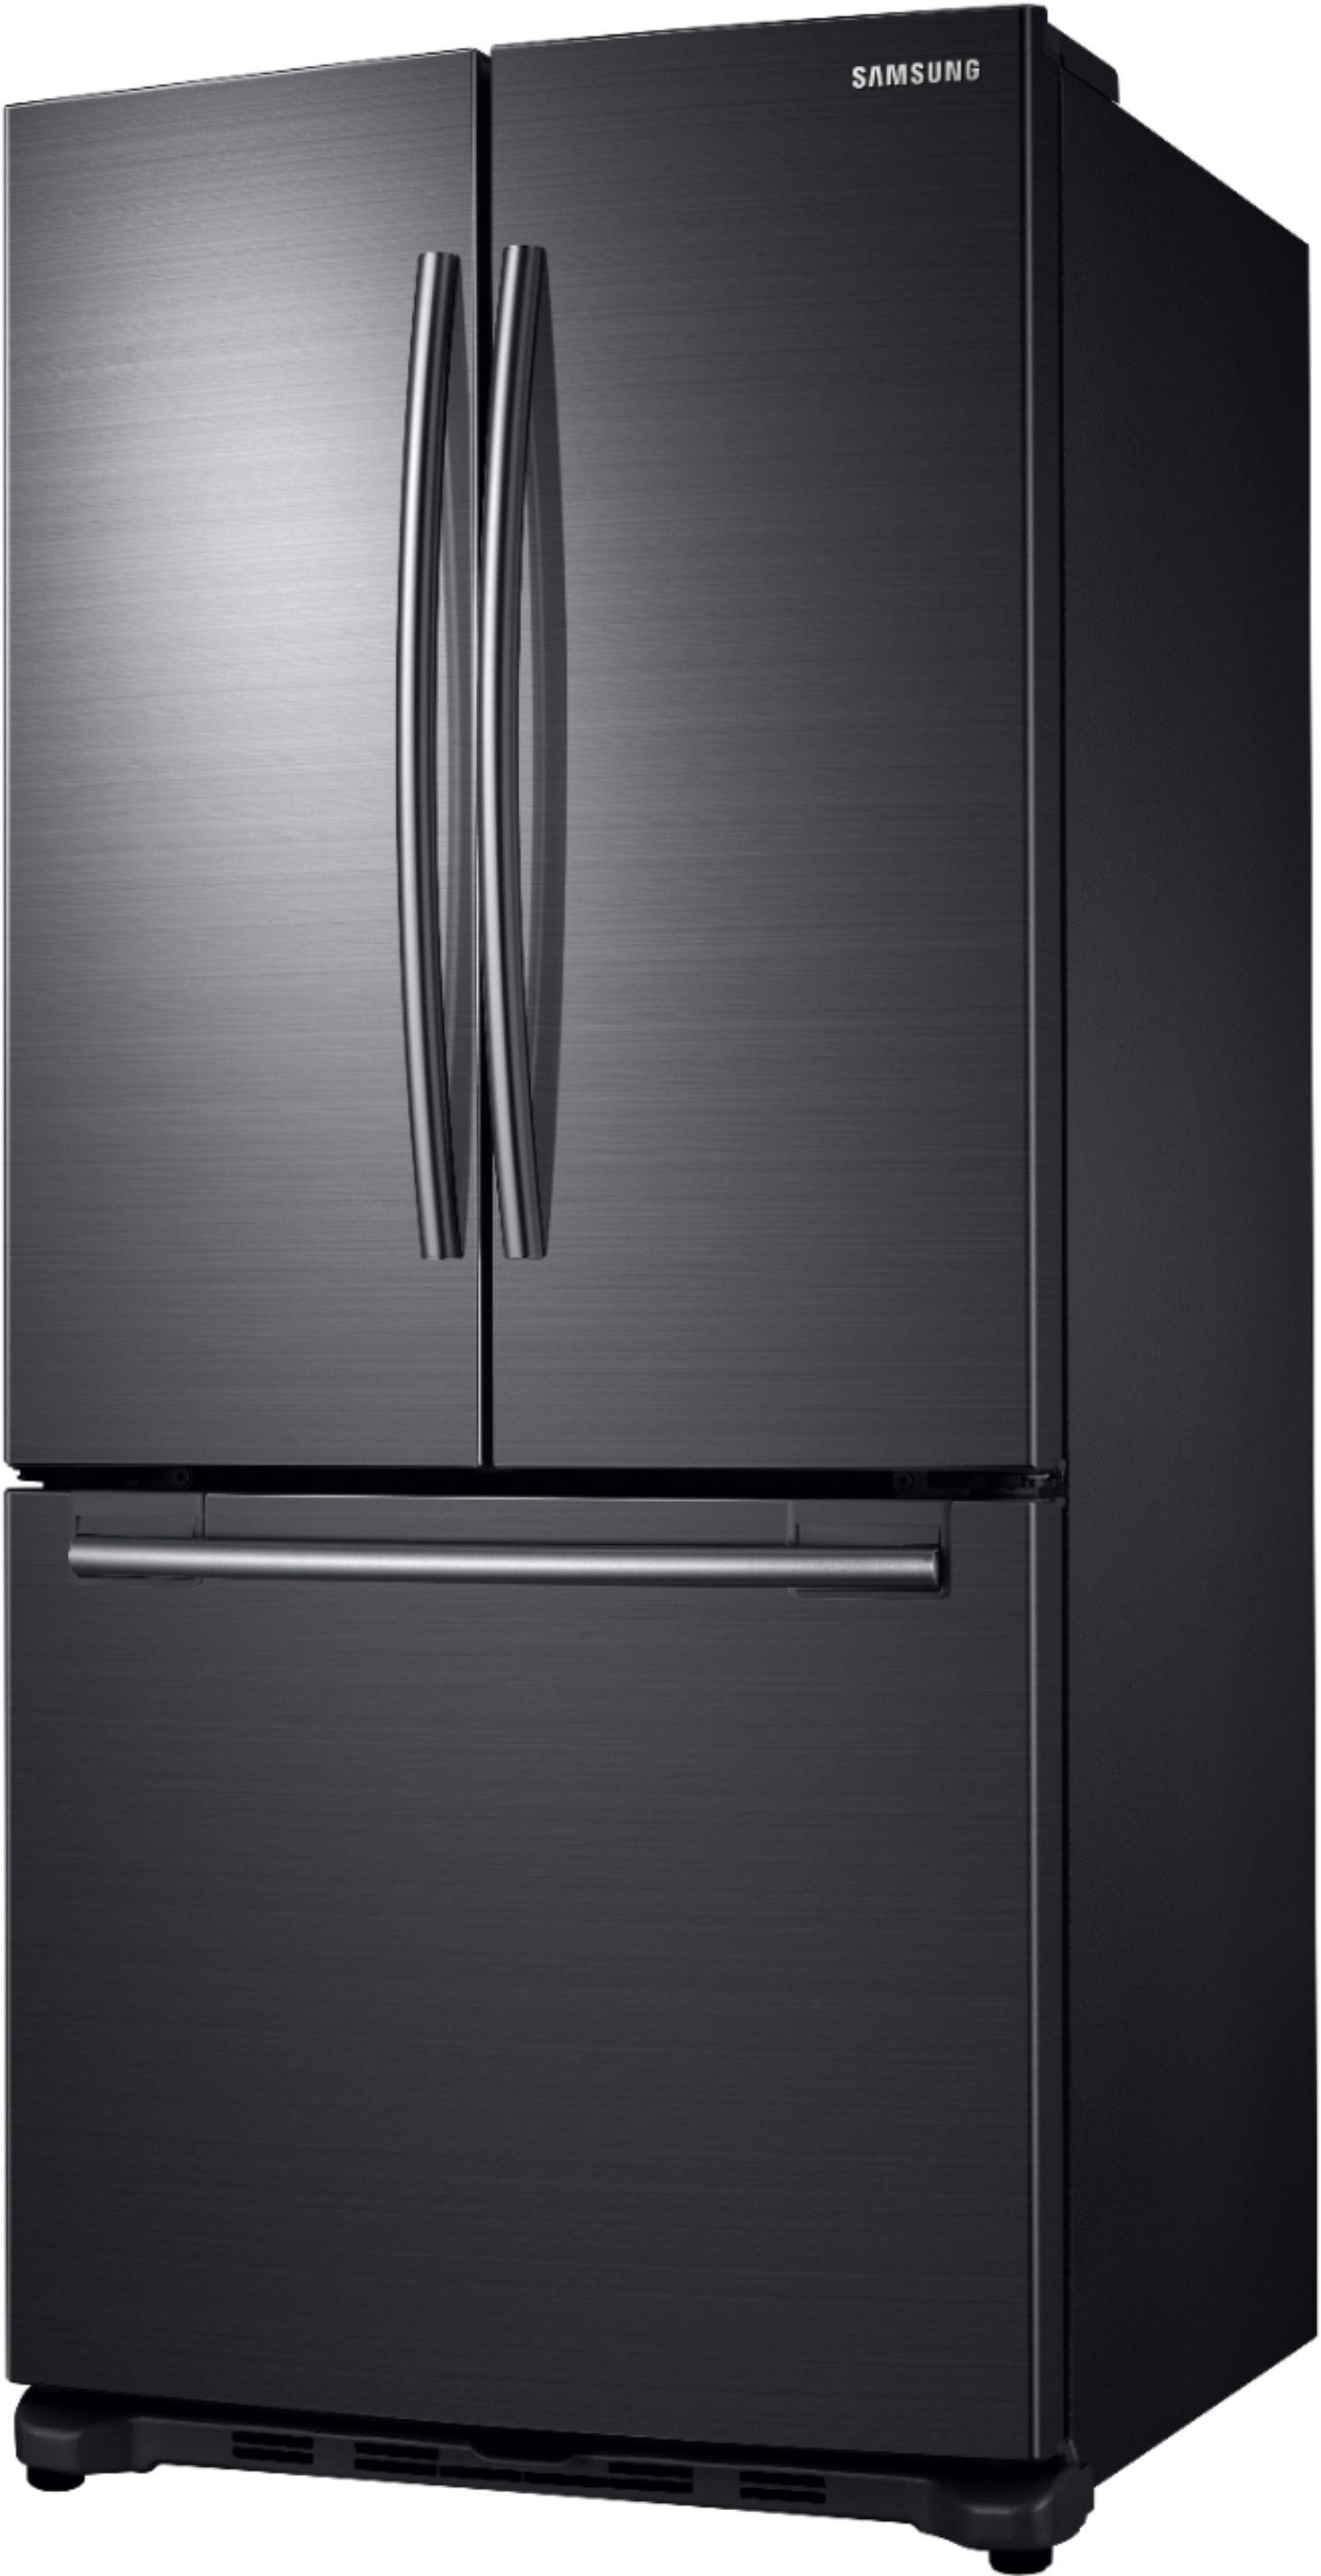 Samsung   20 Cu.Ft. French Door Counter Depth Refrigerator   Fingerprint  Resistant Black Stainless Steel